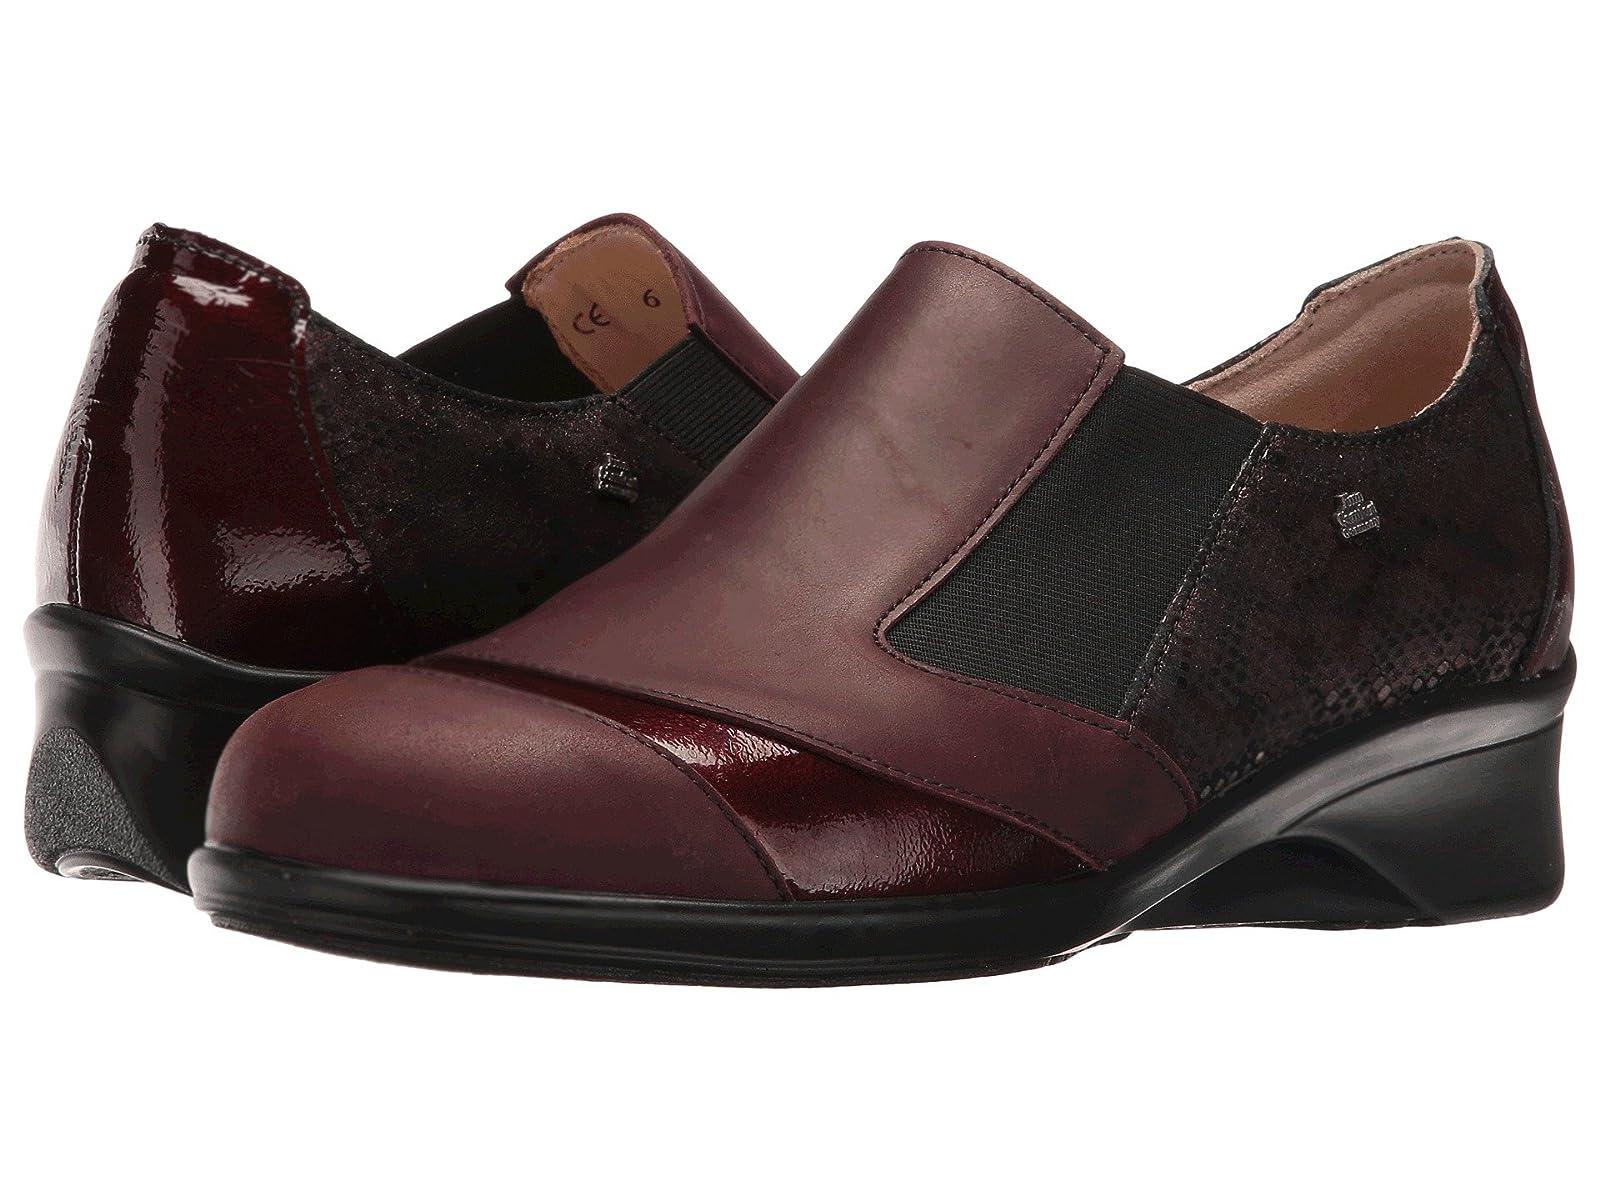 Finn Comfort EdinaCheap and distinctive eye-catching shoes